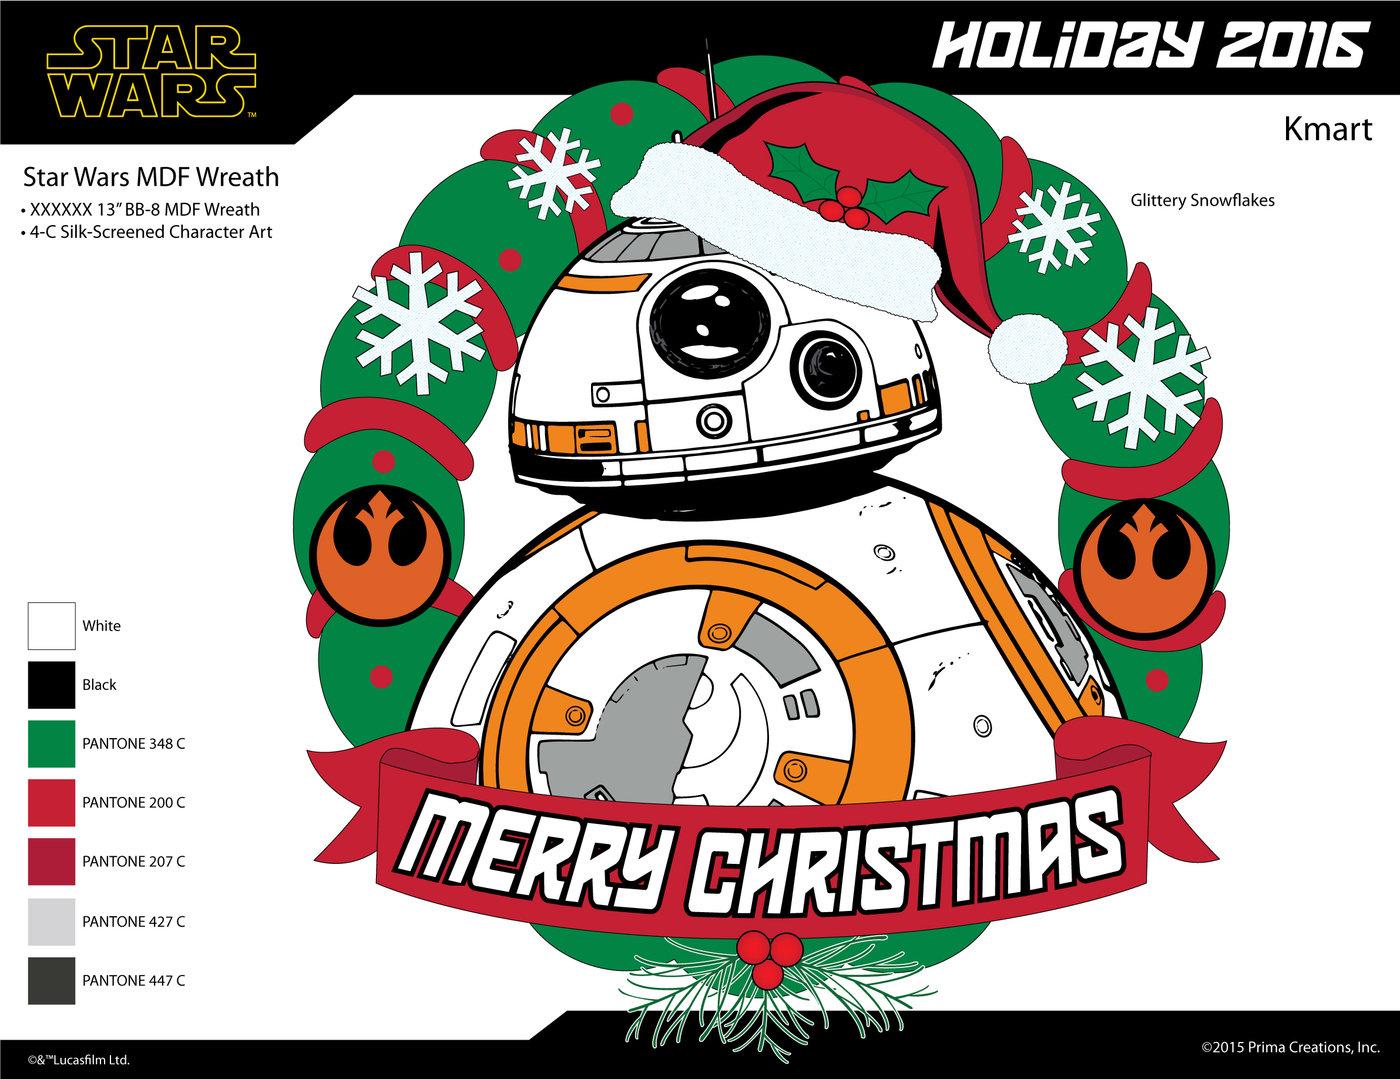 Star Wars by Ariel Vila at Coroflot com